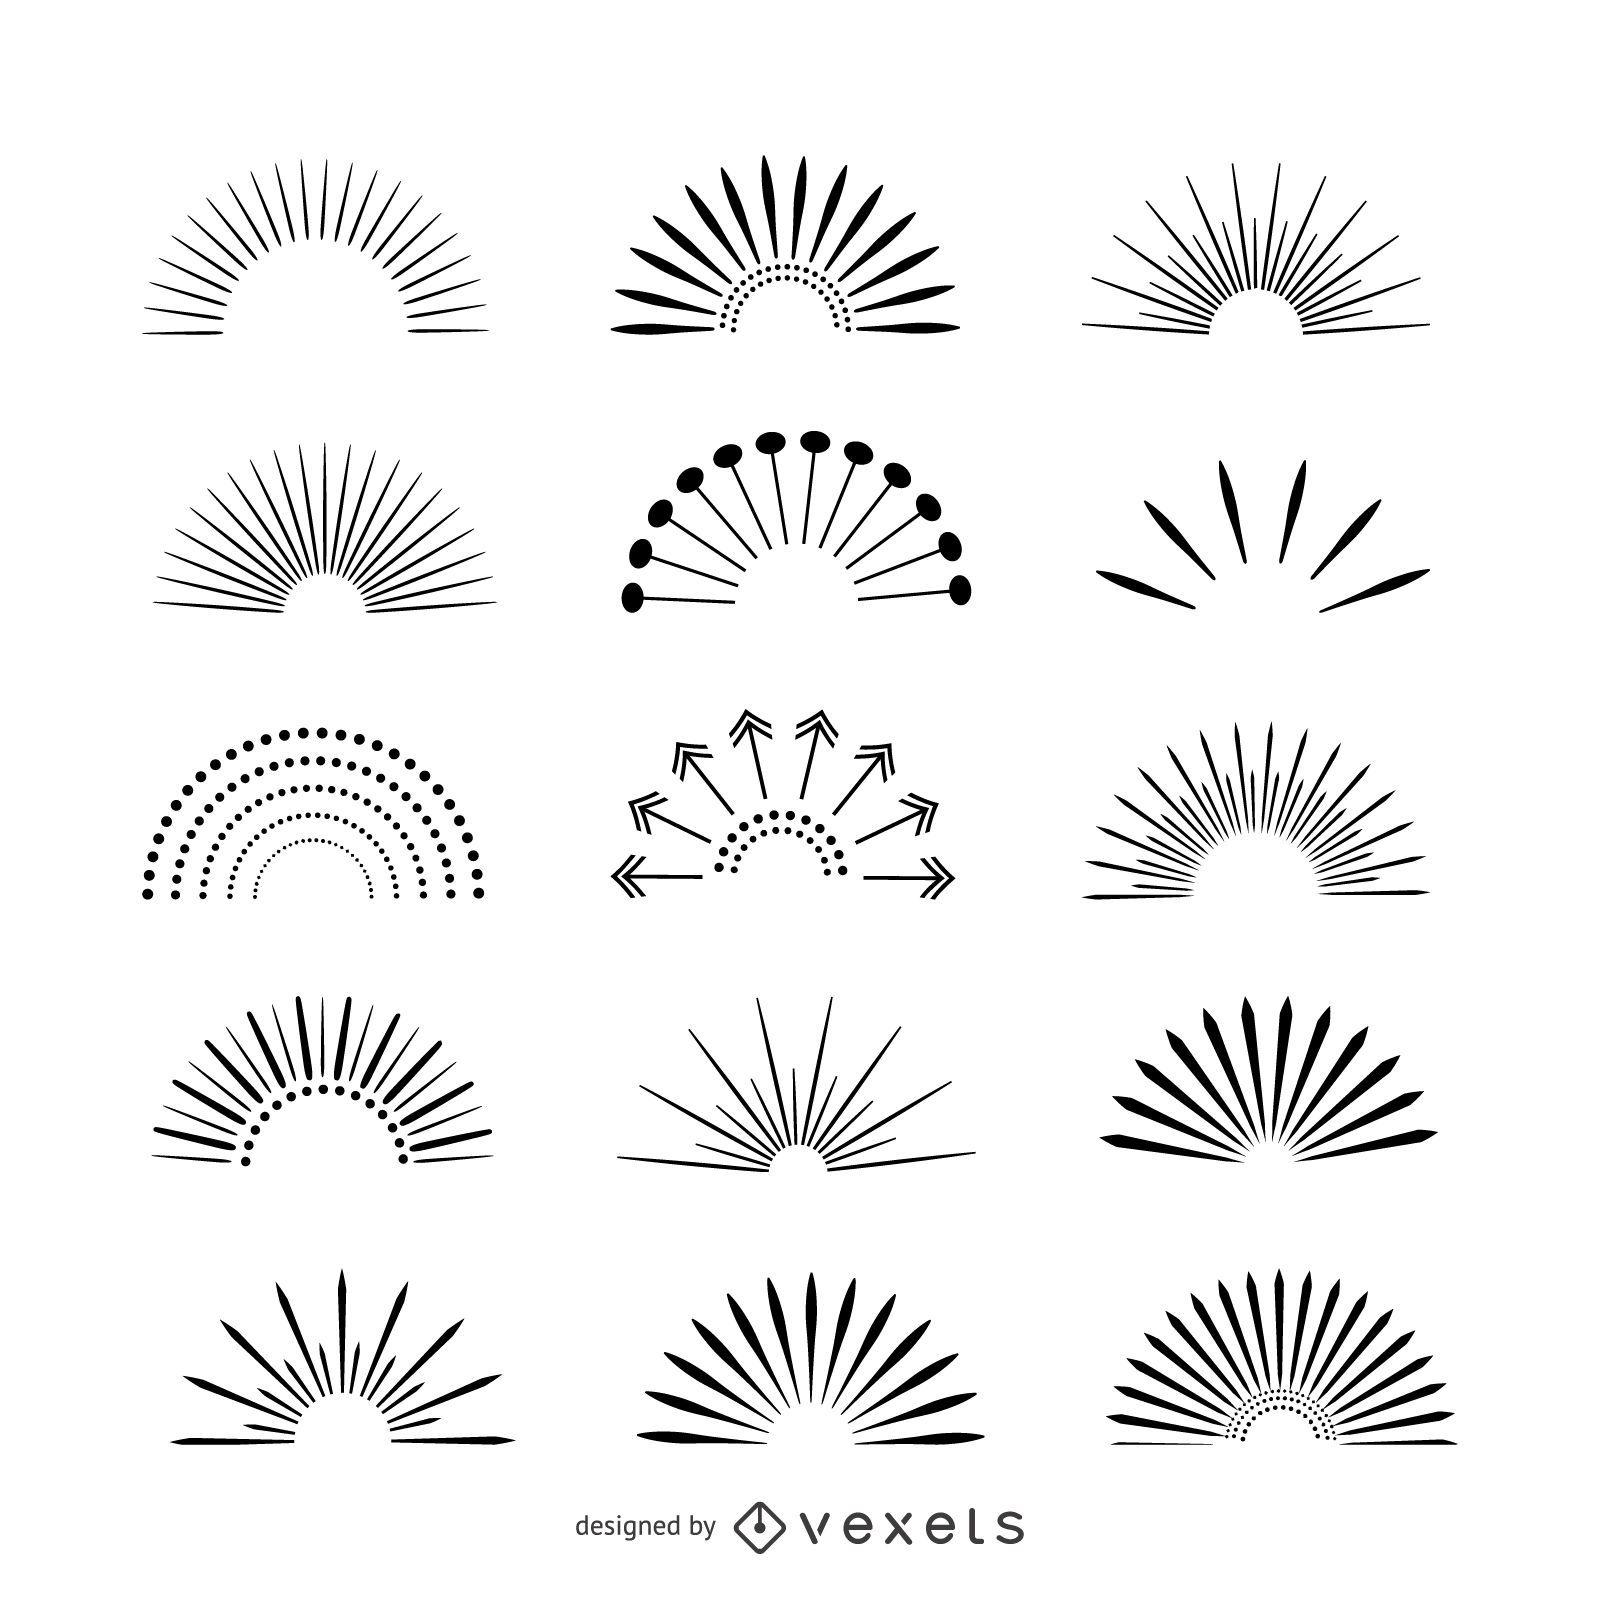 Sunburst Illustration Collection